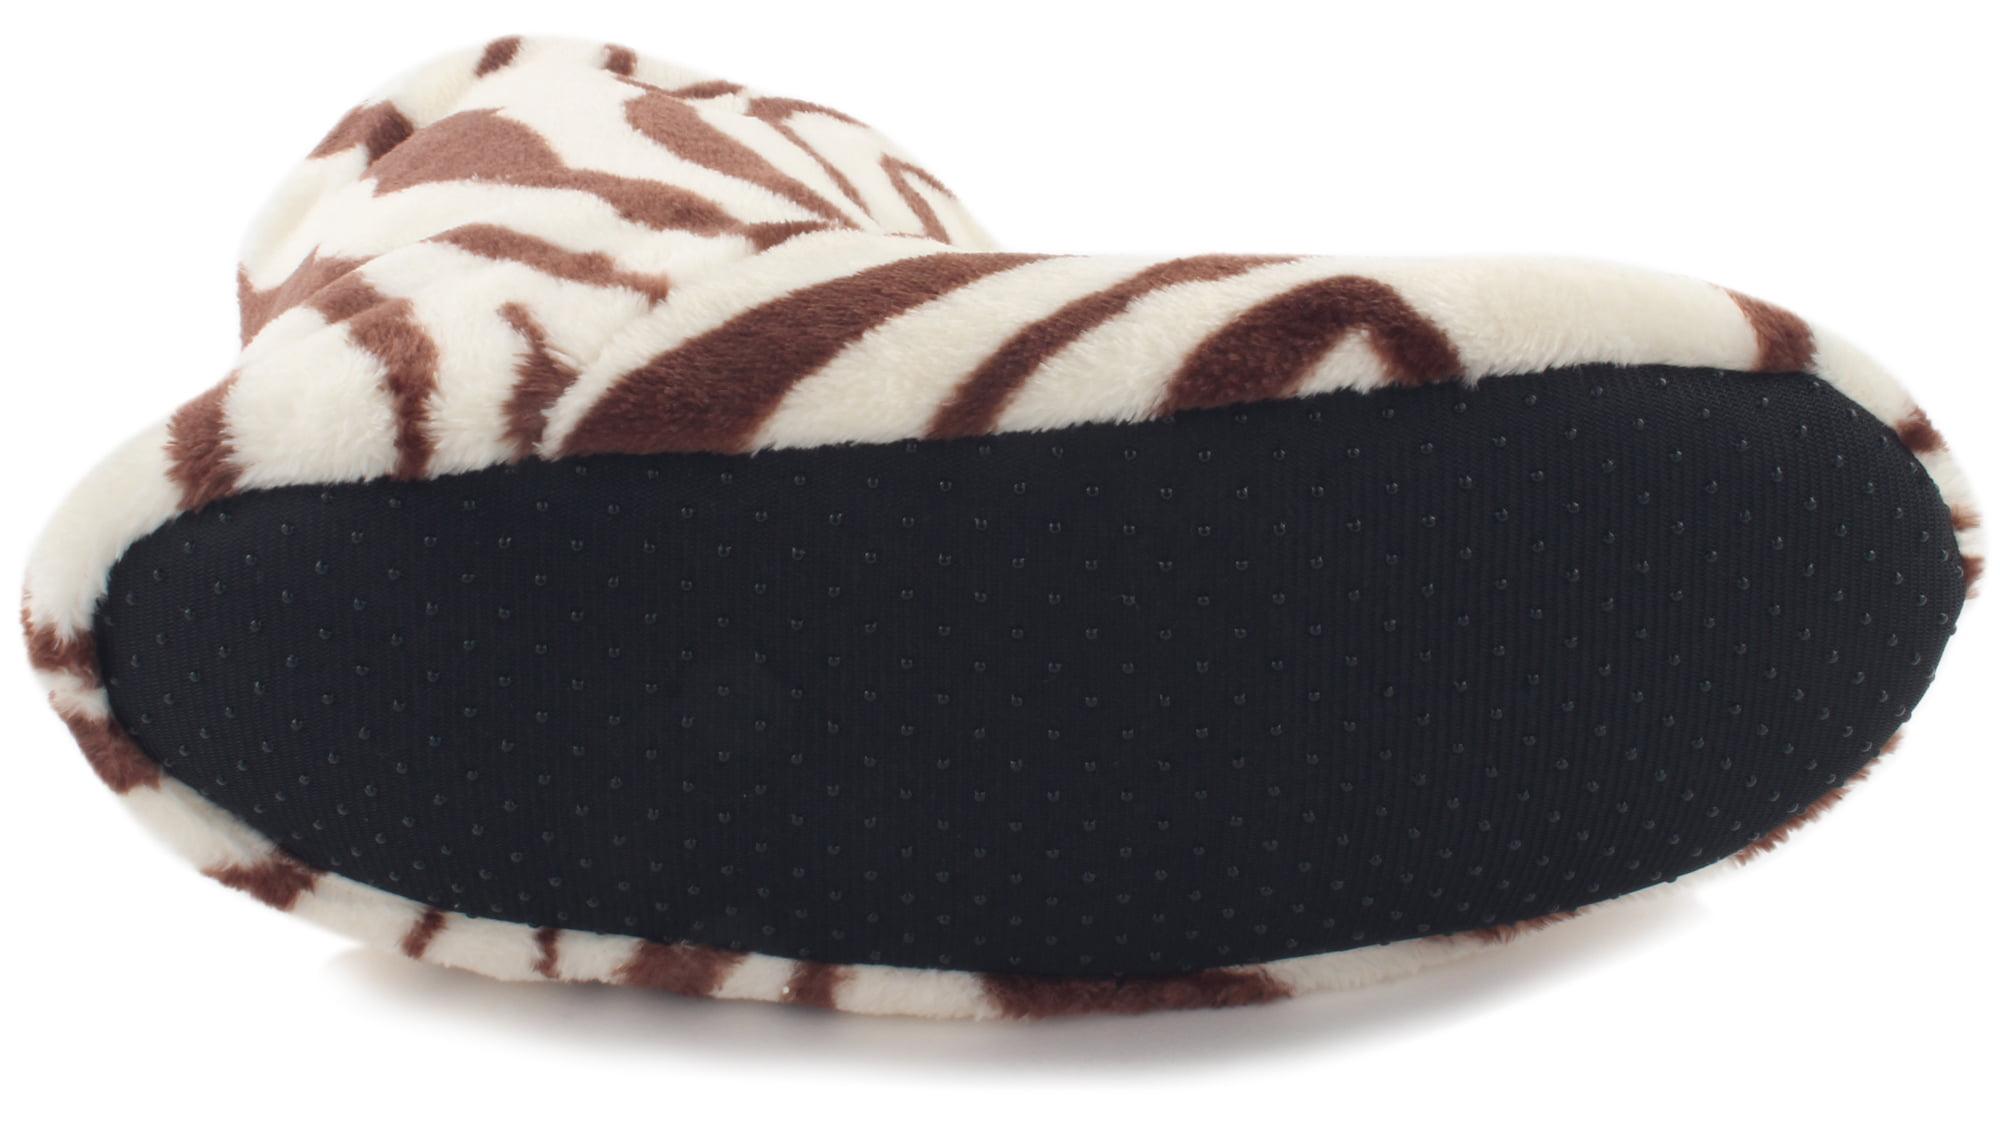 Women's Fashion Plush Faux Fur Zebra Print Indoor Non Slip | House Slippers Off White | Slip Brown Small Medium (25cm) e6ccbb